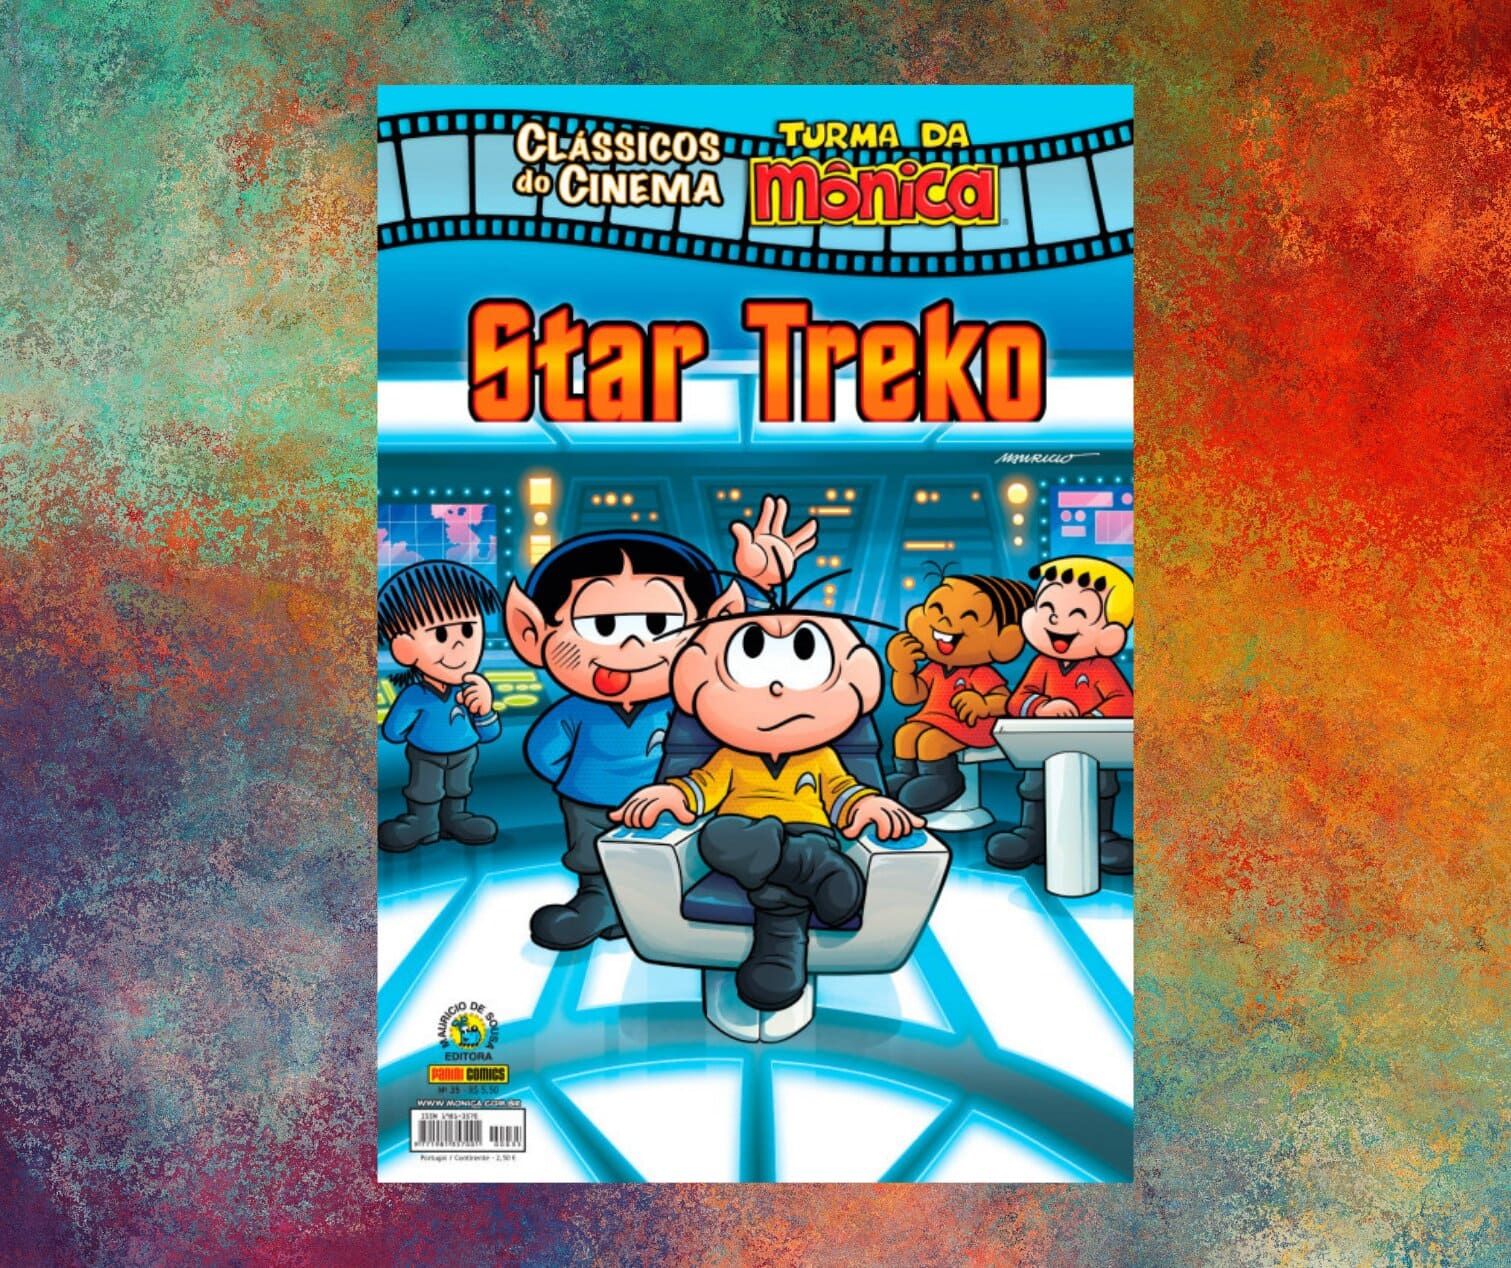 Resenha: Star Treko - Star Treko - Garotada nas Estrelas